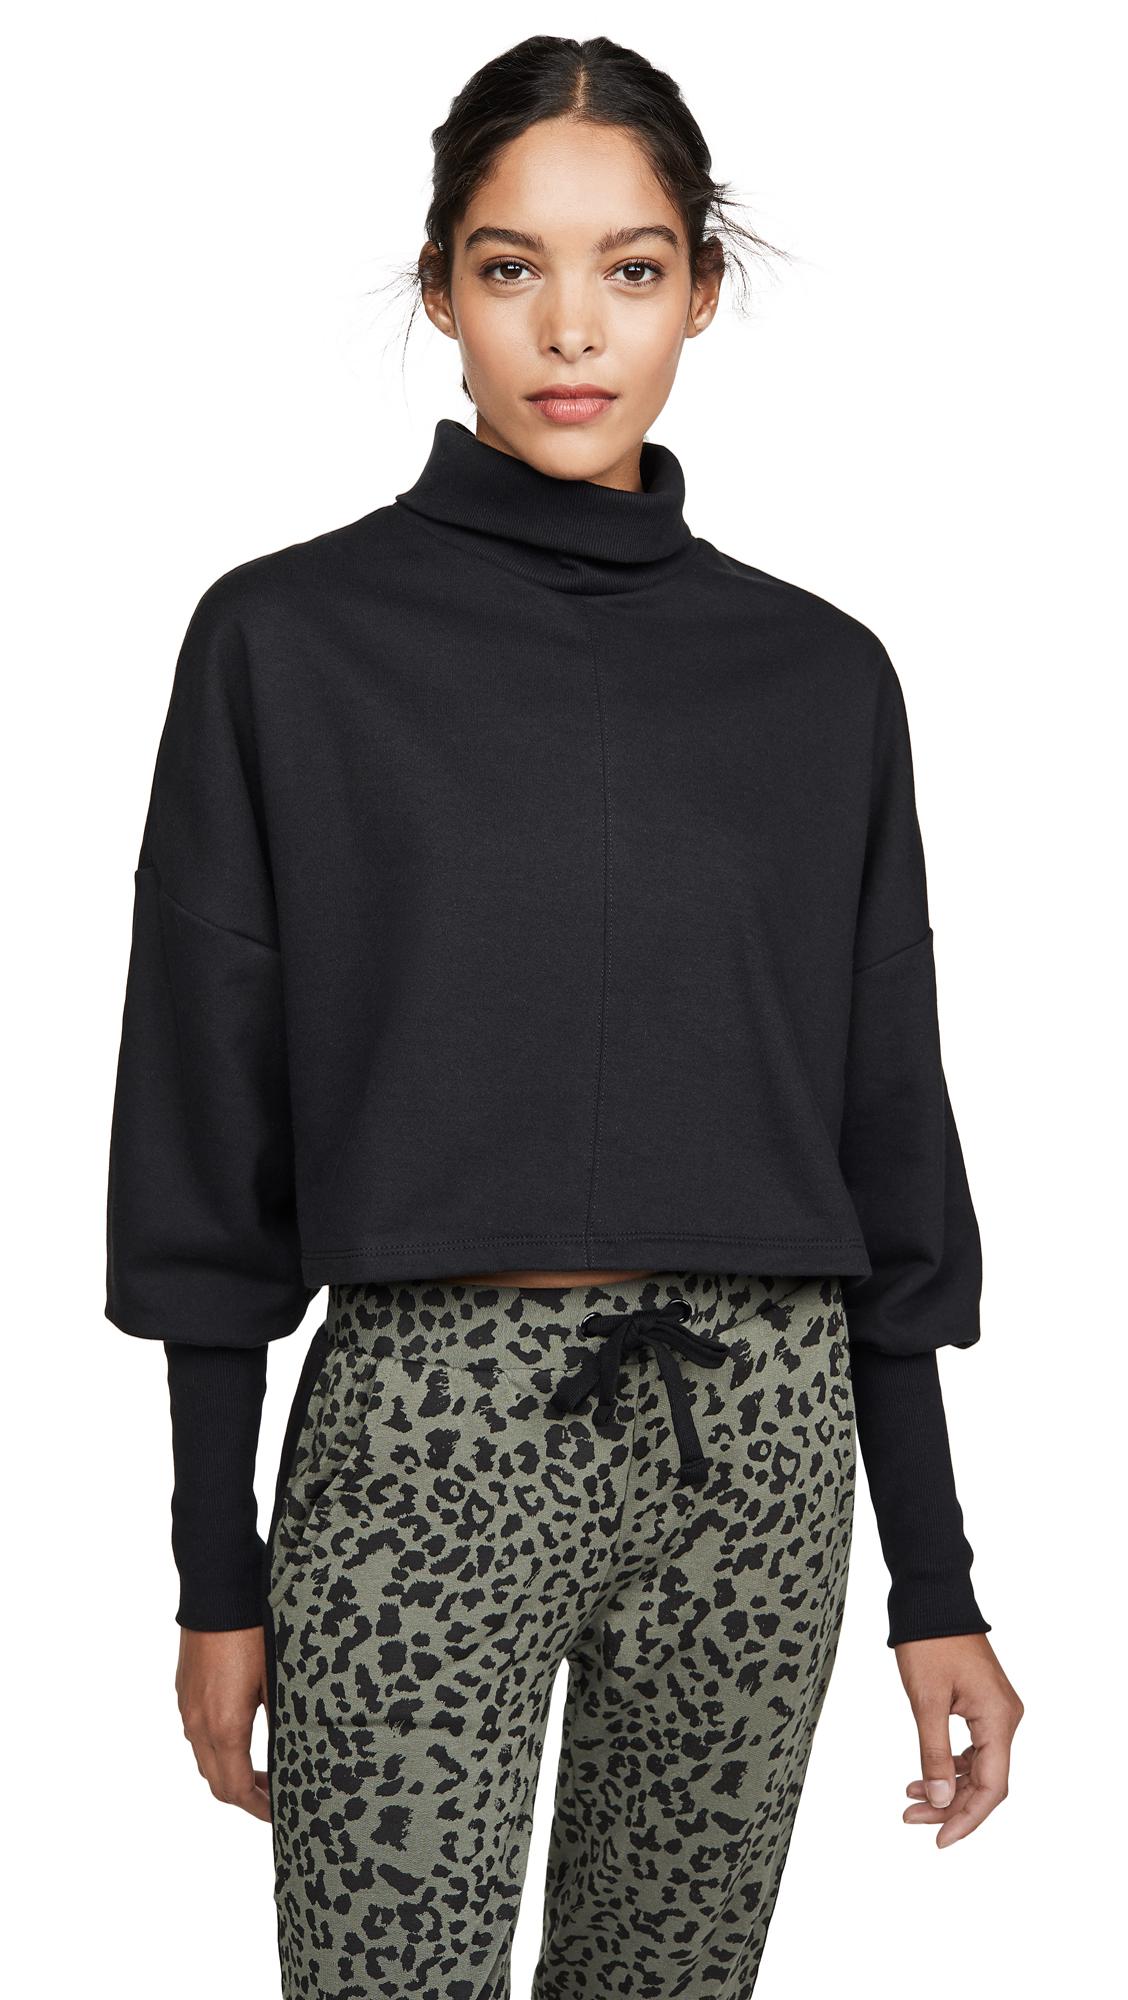 The Range Divided Turtleneck Sweatshirt - 30% Off Sale